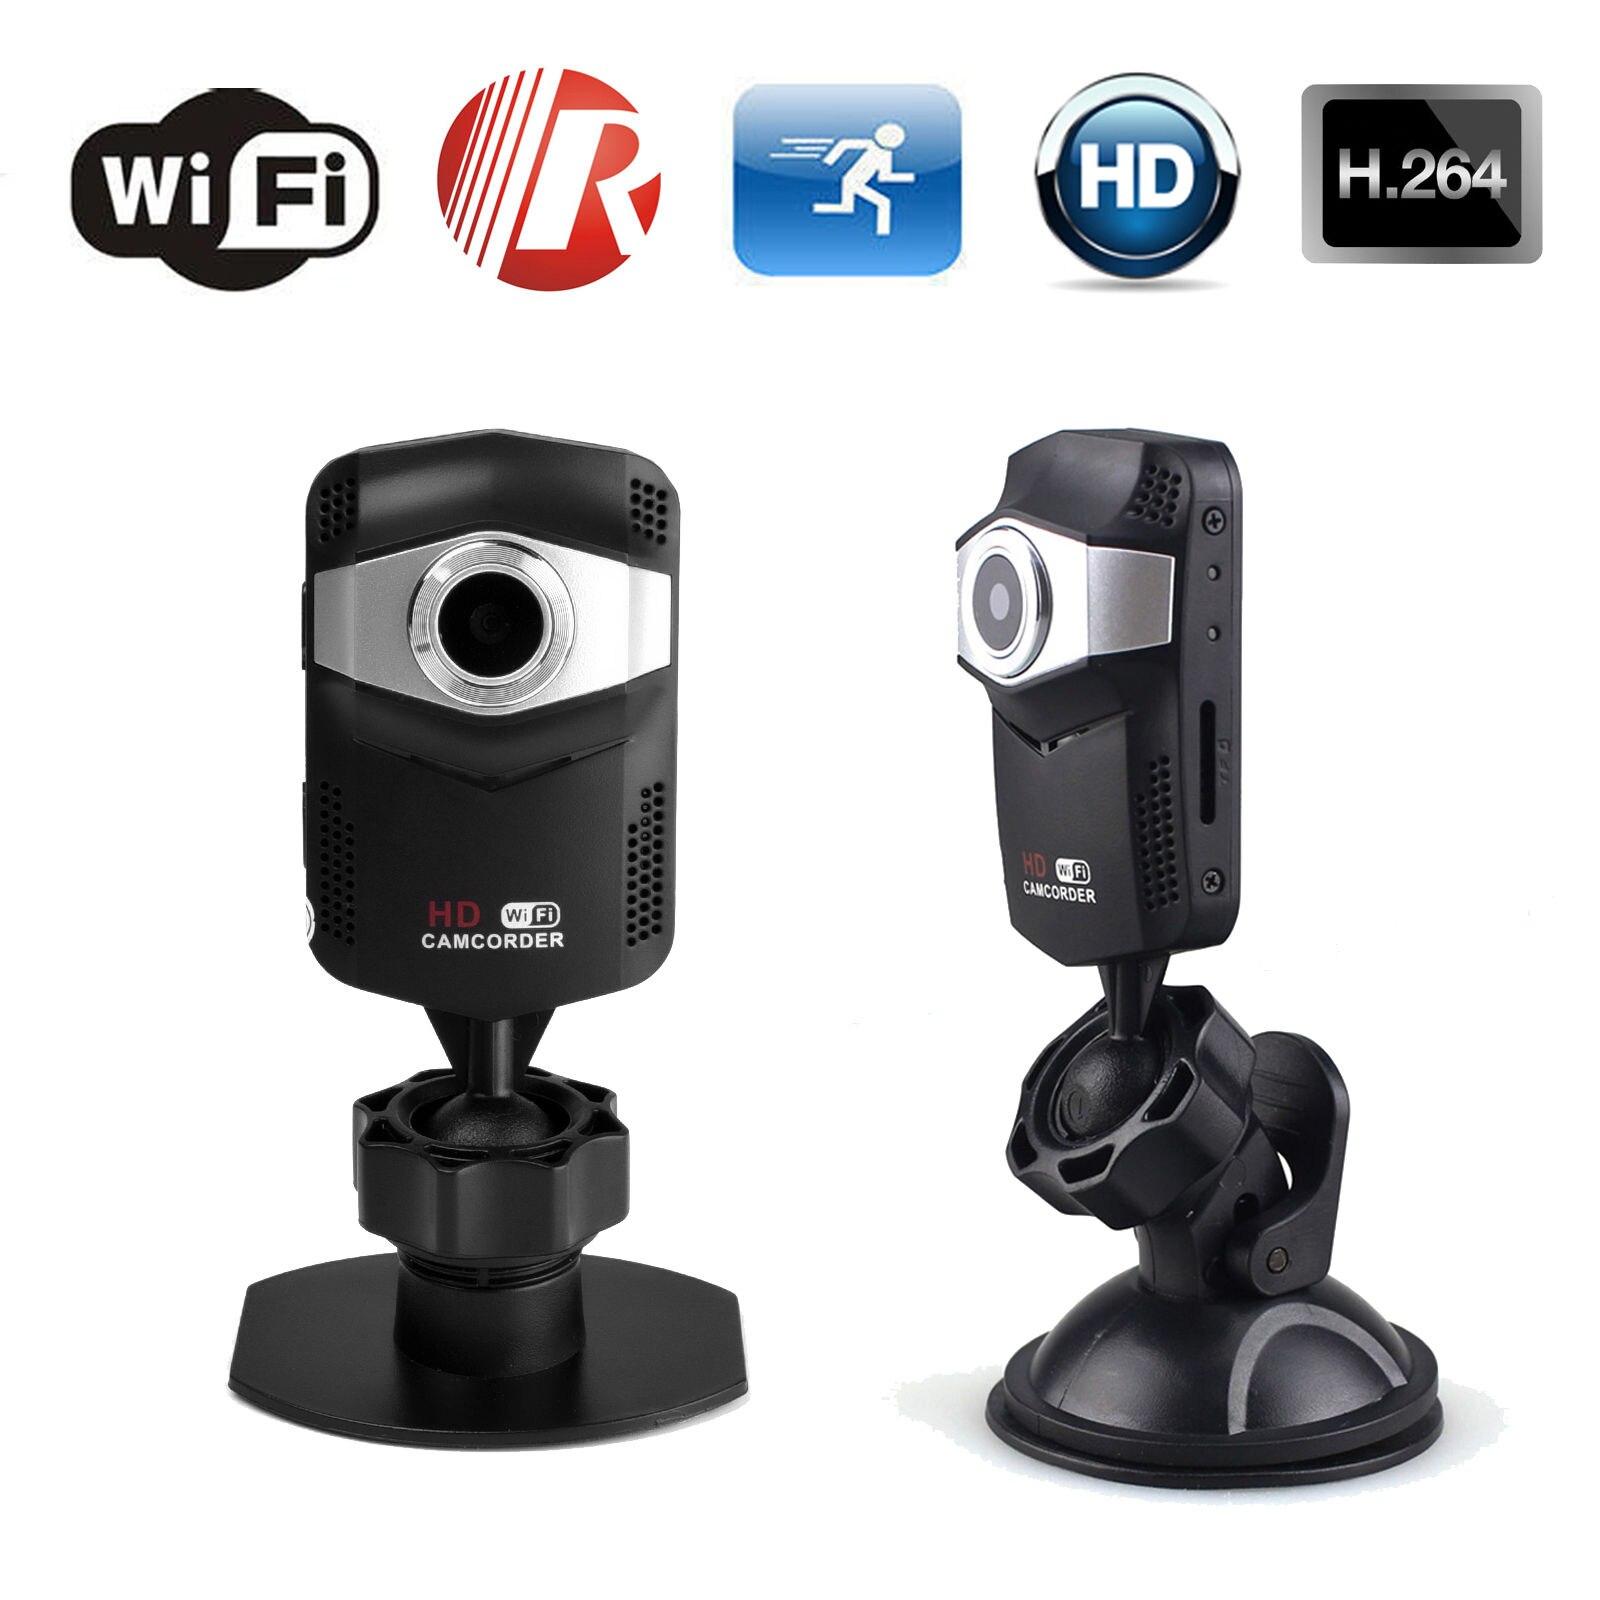 8GB Card+Wifi IP Mini Wireless HD 720P Motion Detect IR Network Security Camera DVR8GB Card+Wifi IP Mini Wireless HD 720P Motion Detect IR Network Security Camera DVR